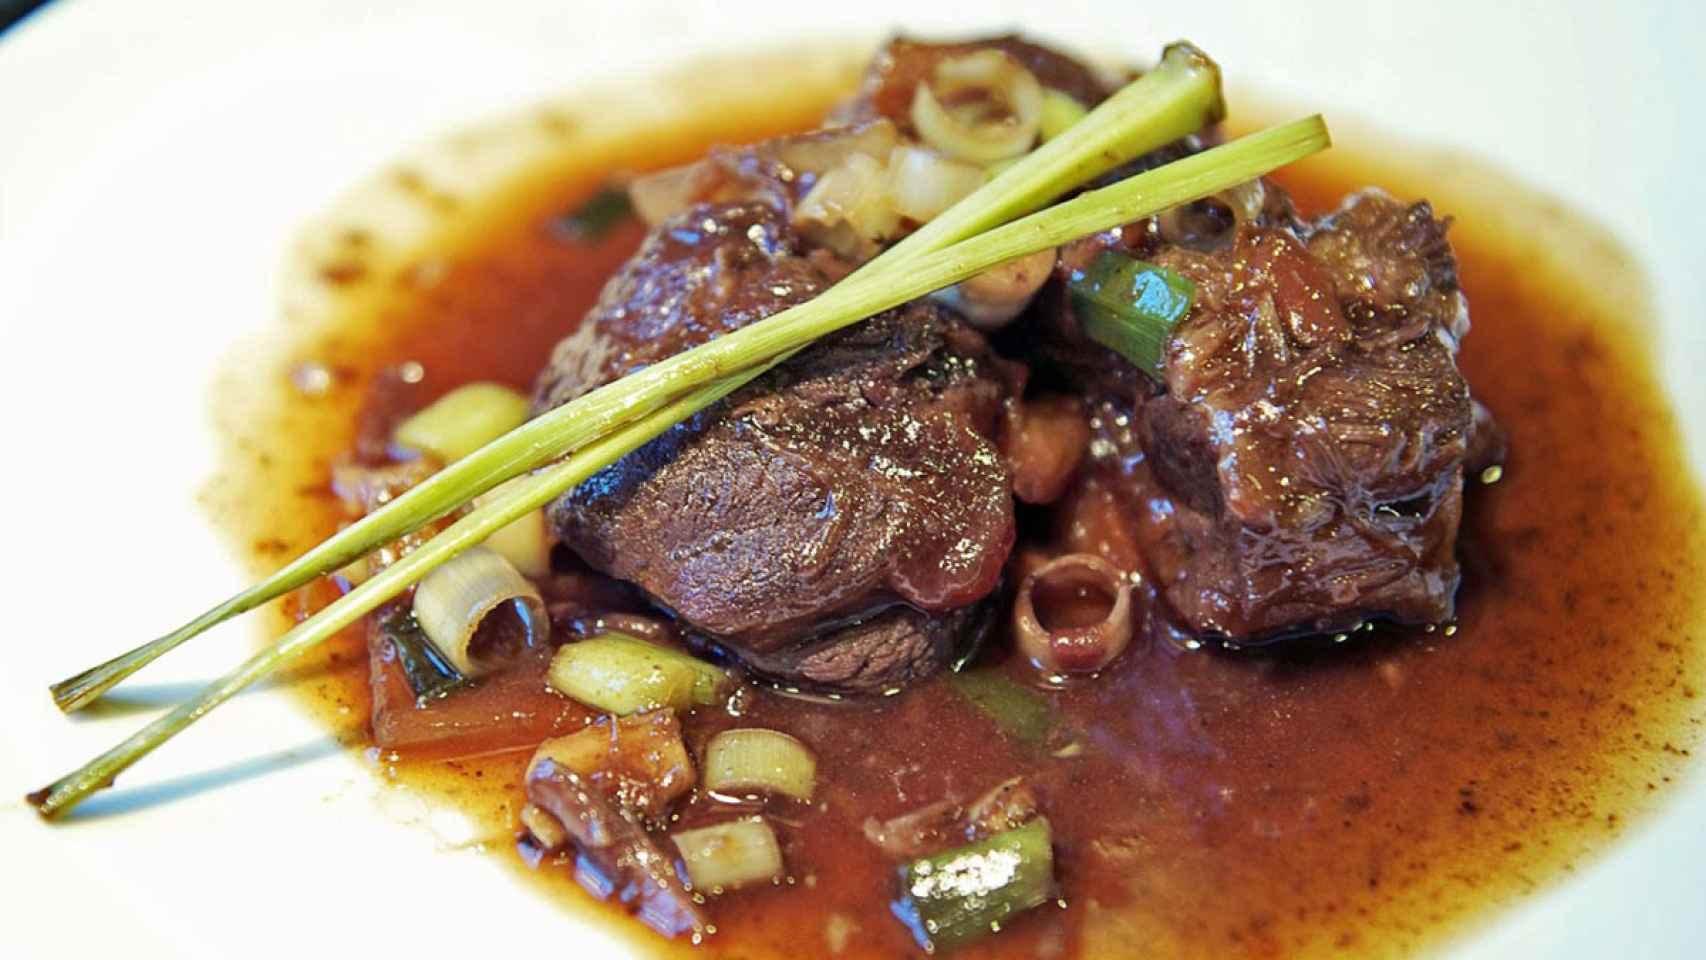 Un plato de rabo de toro con un aspecto delicioso.